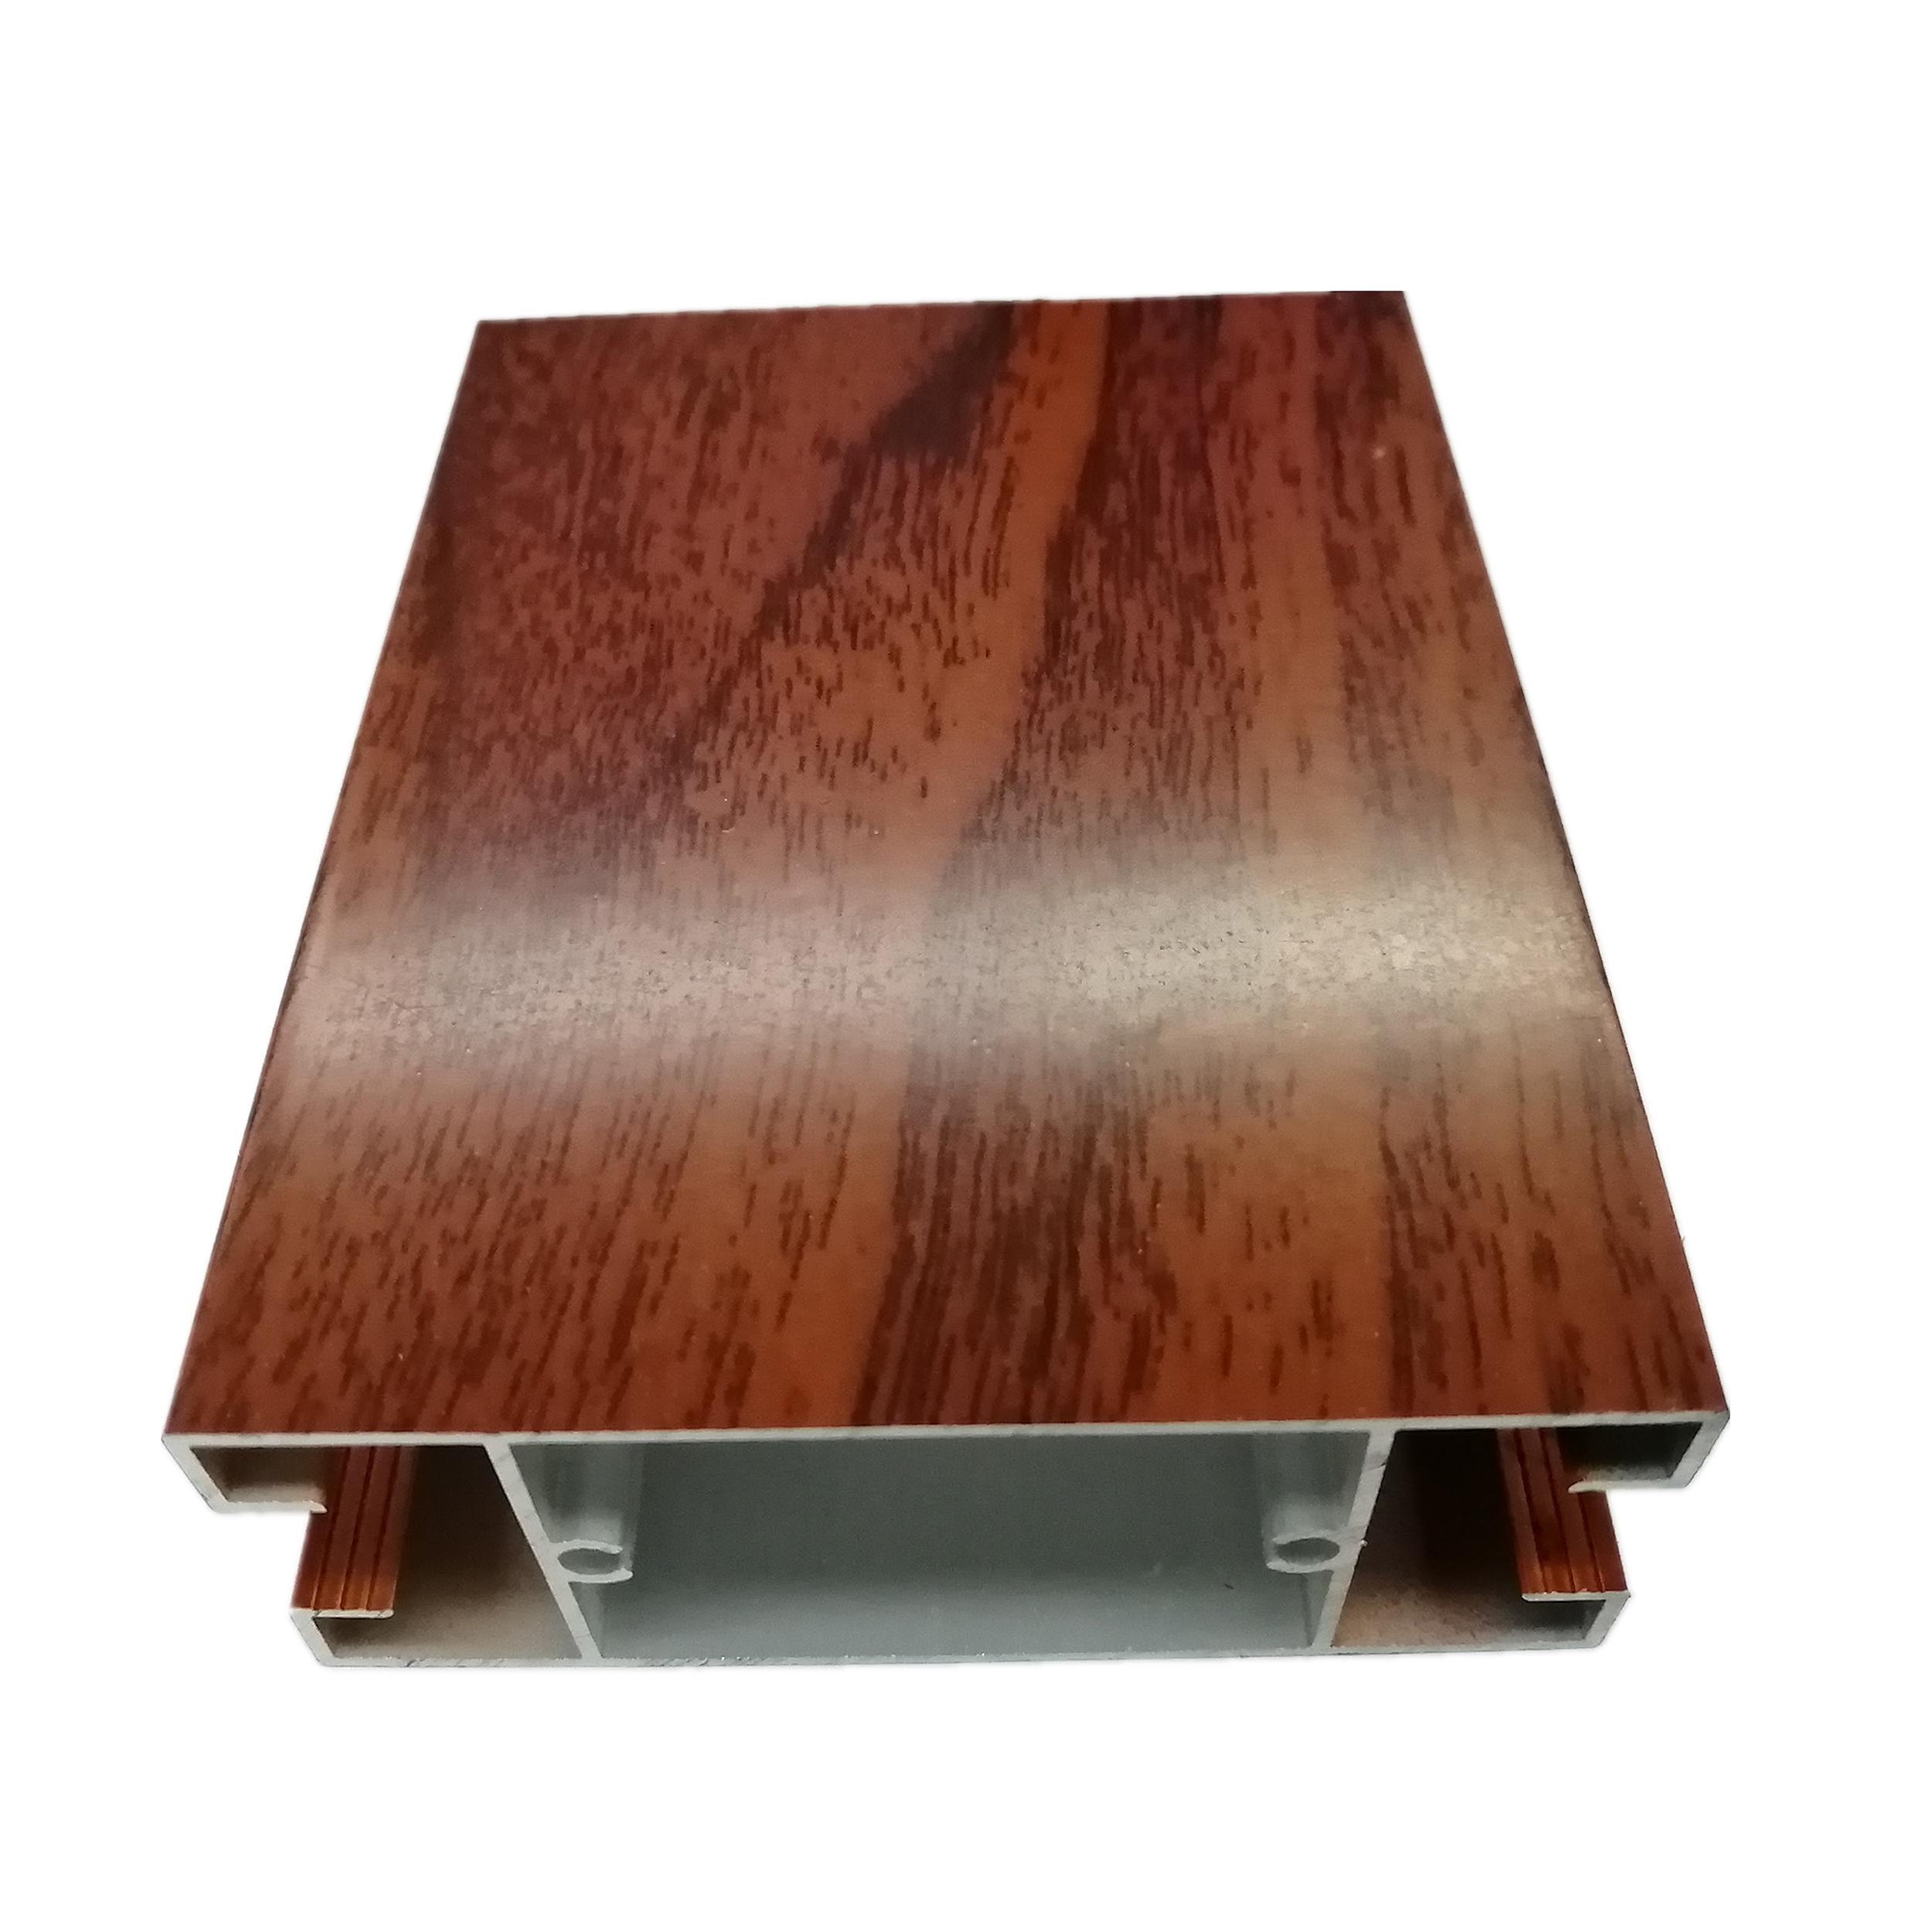 6063 Wood Finish Aluminium Profiles Heat Transfer Wood Grain Profiles Building Decoration Aluminum Frame